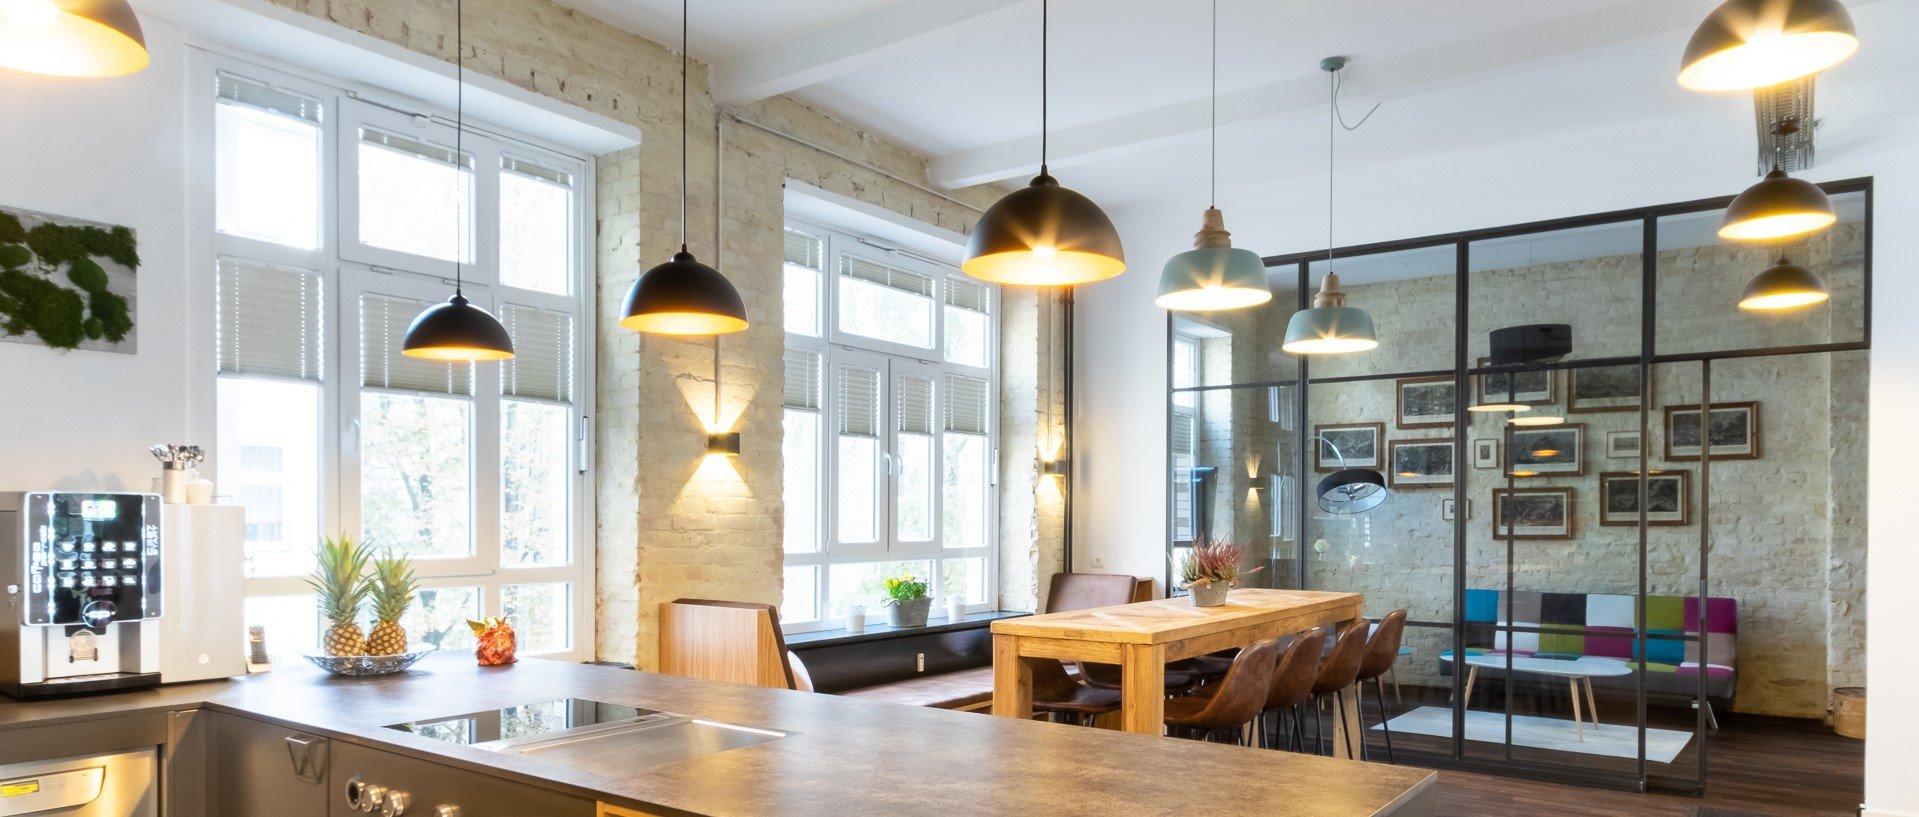 Berlin Hub Kitchen Area schmal.jpg